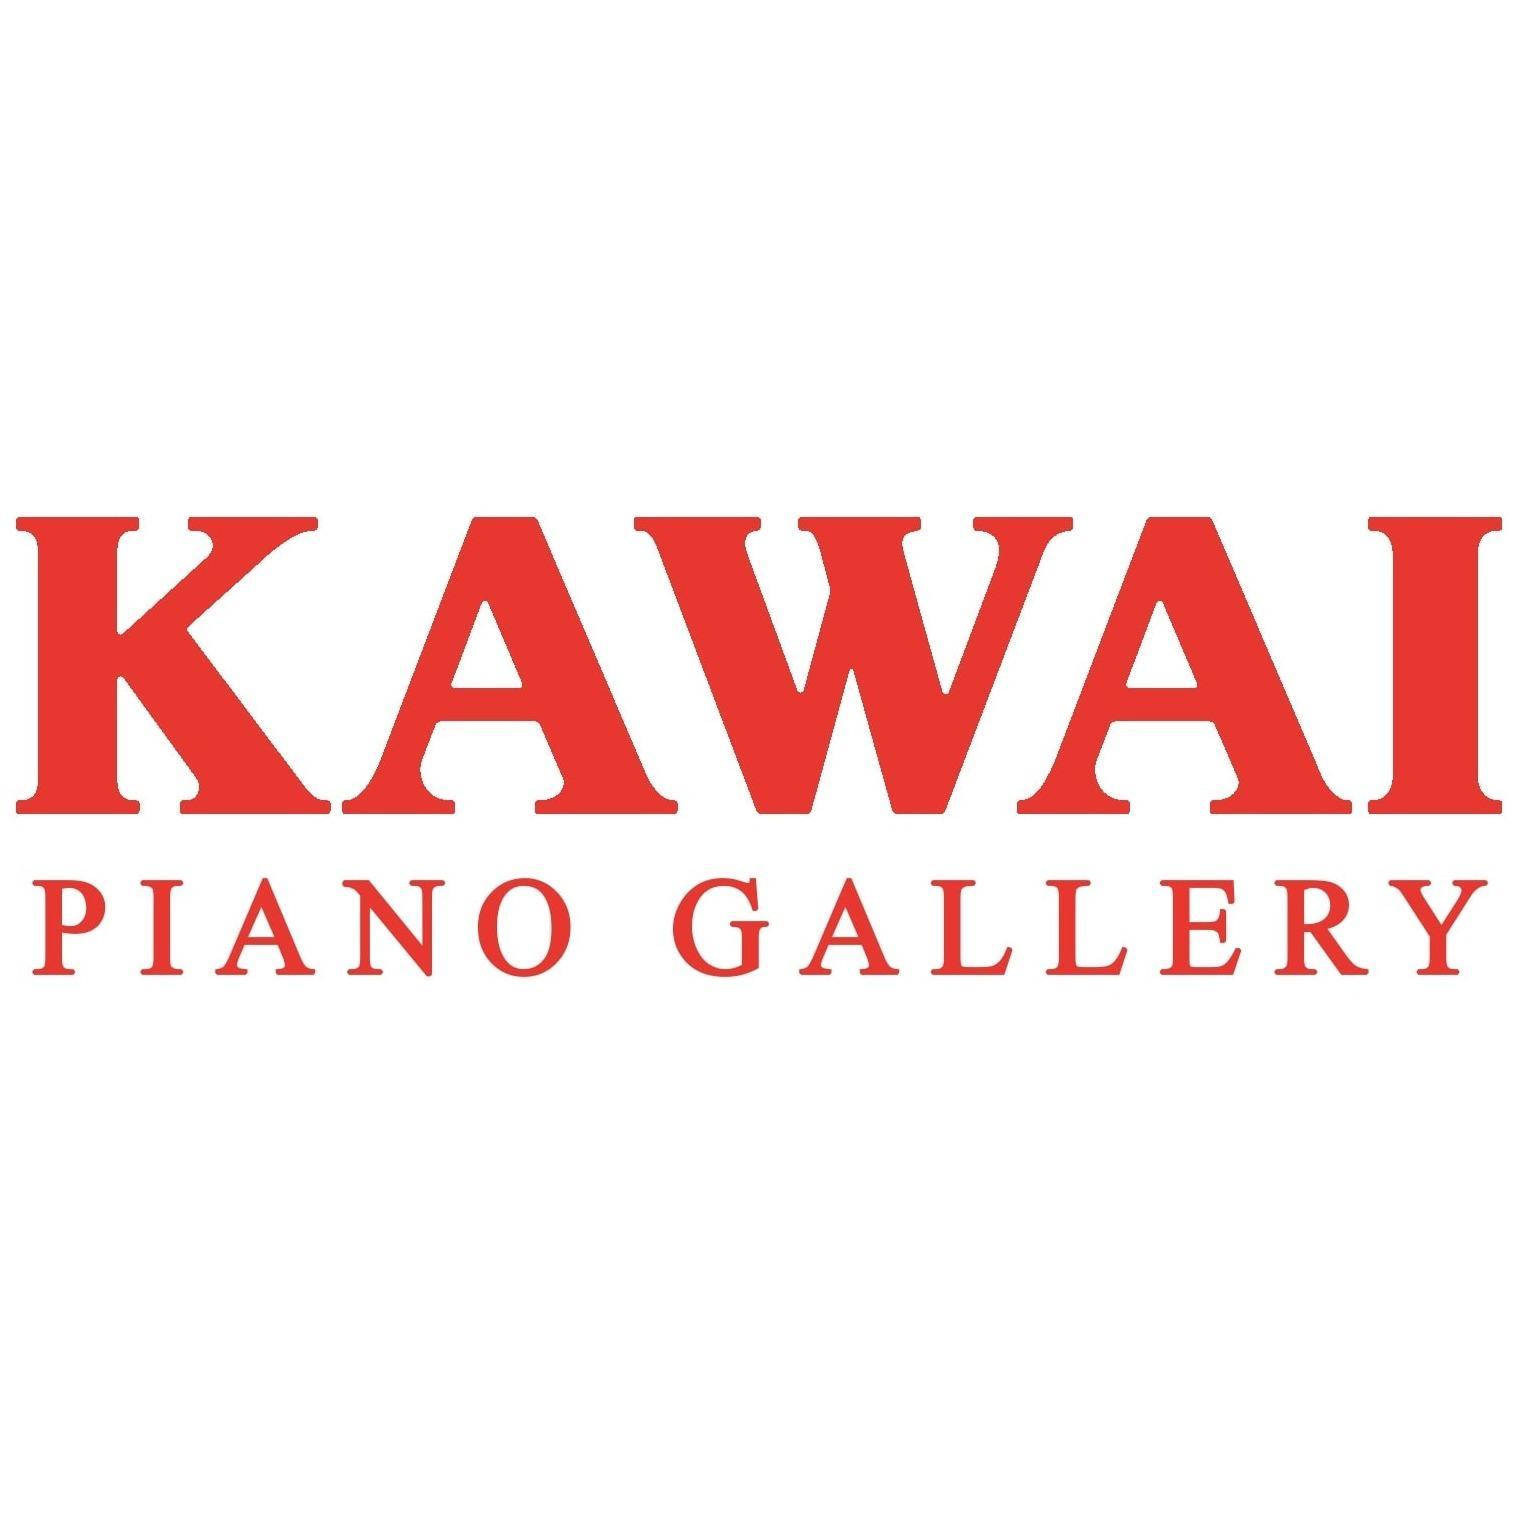 Kawai Piano Gallery